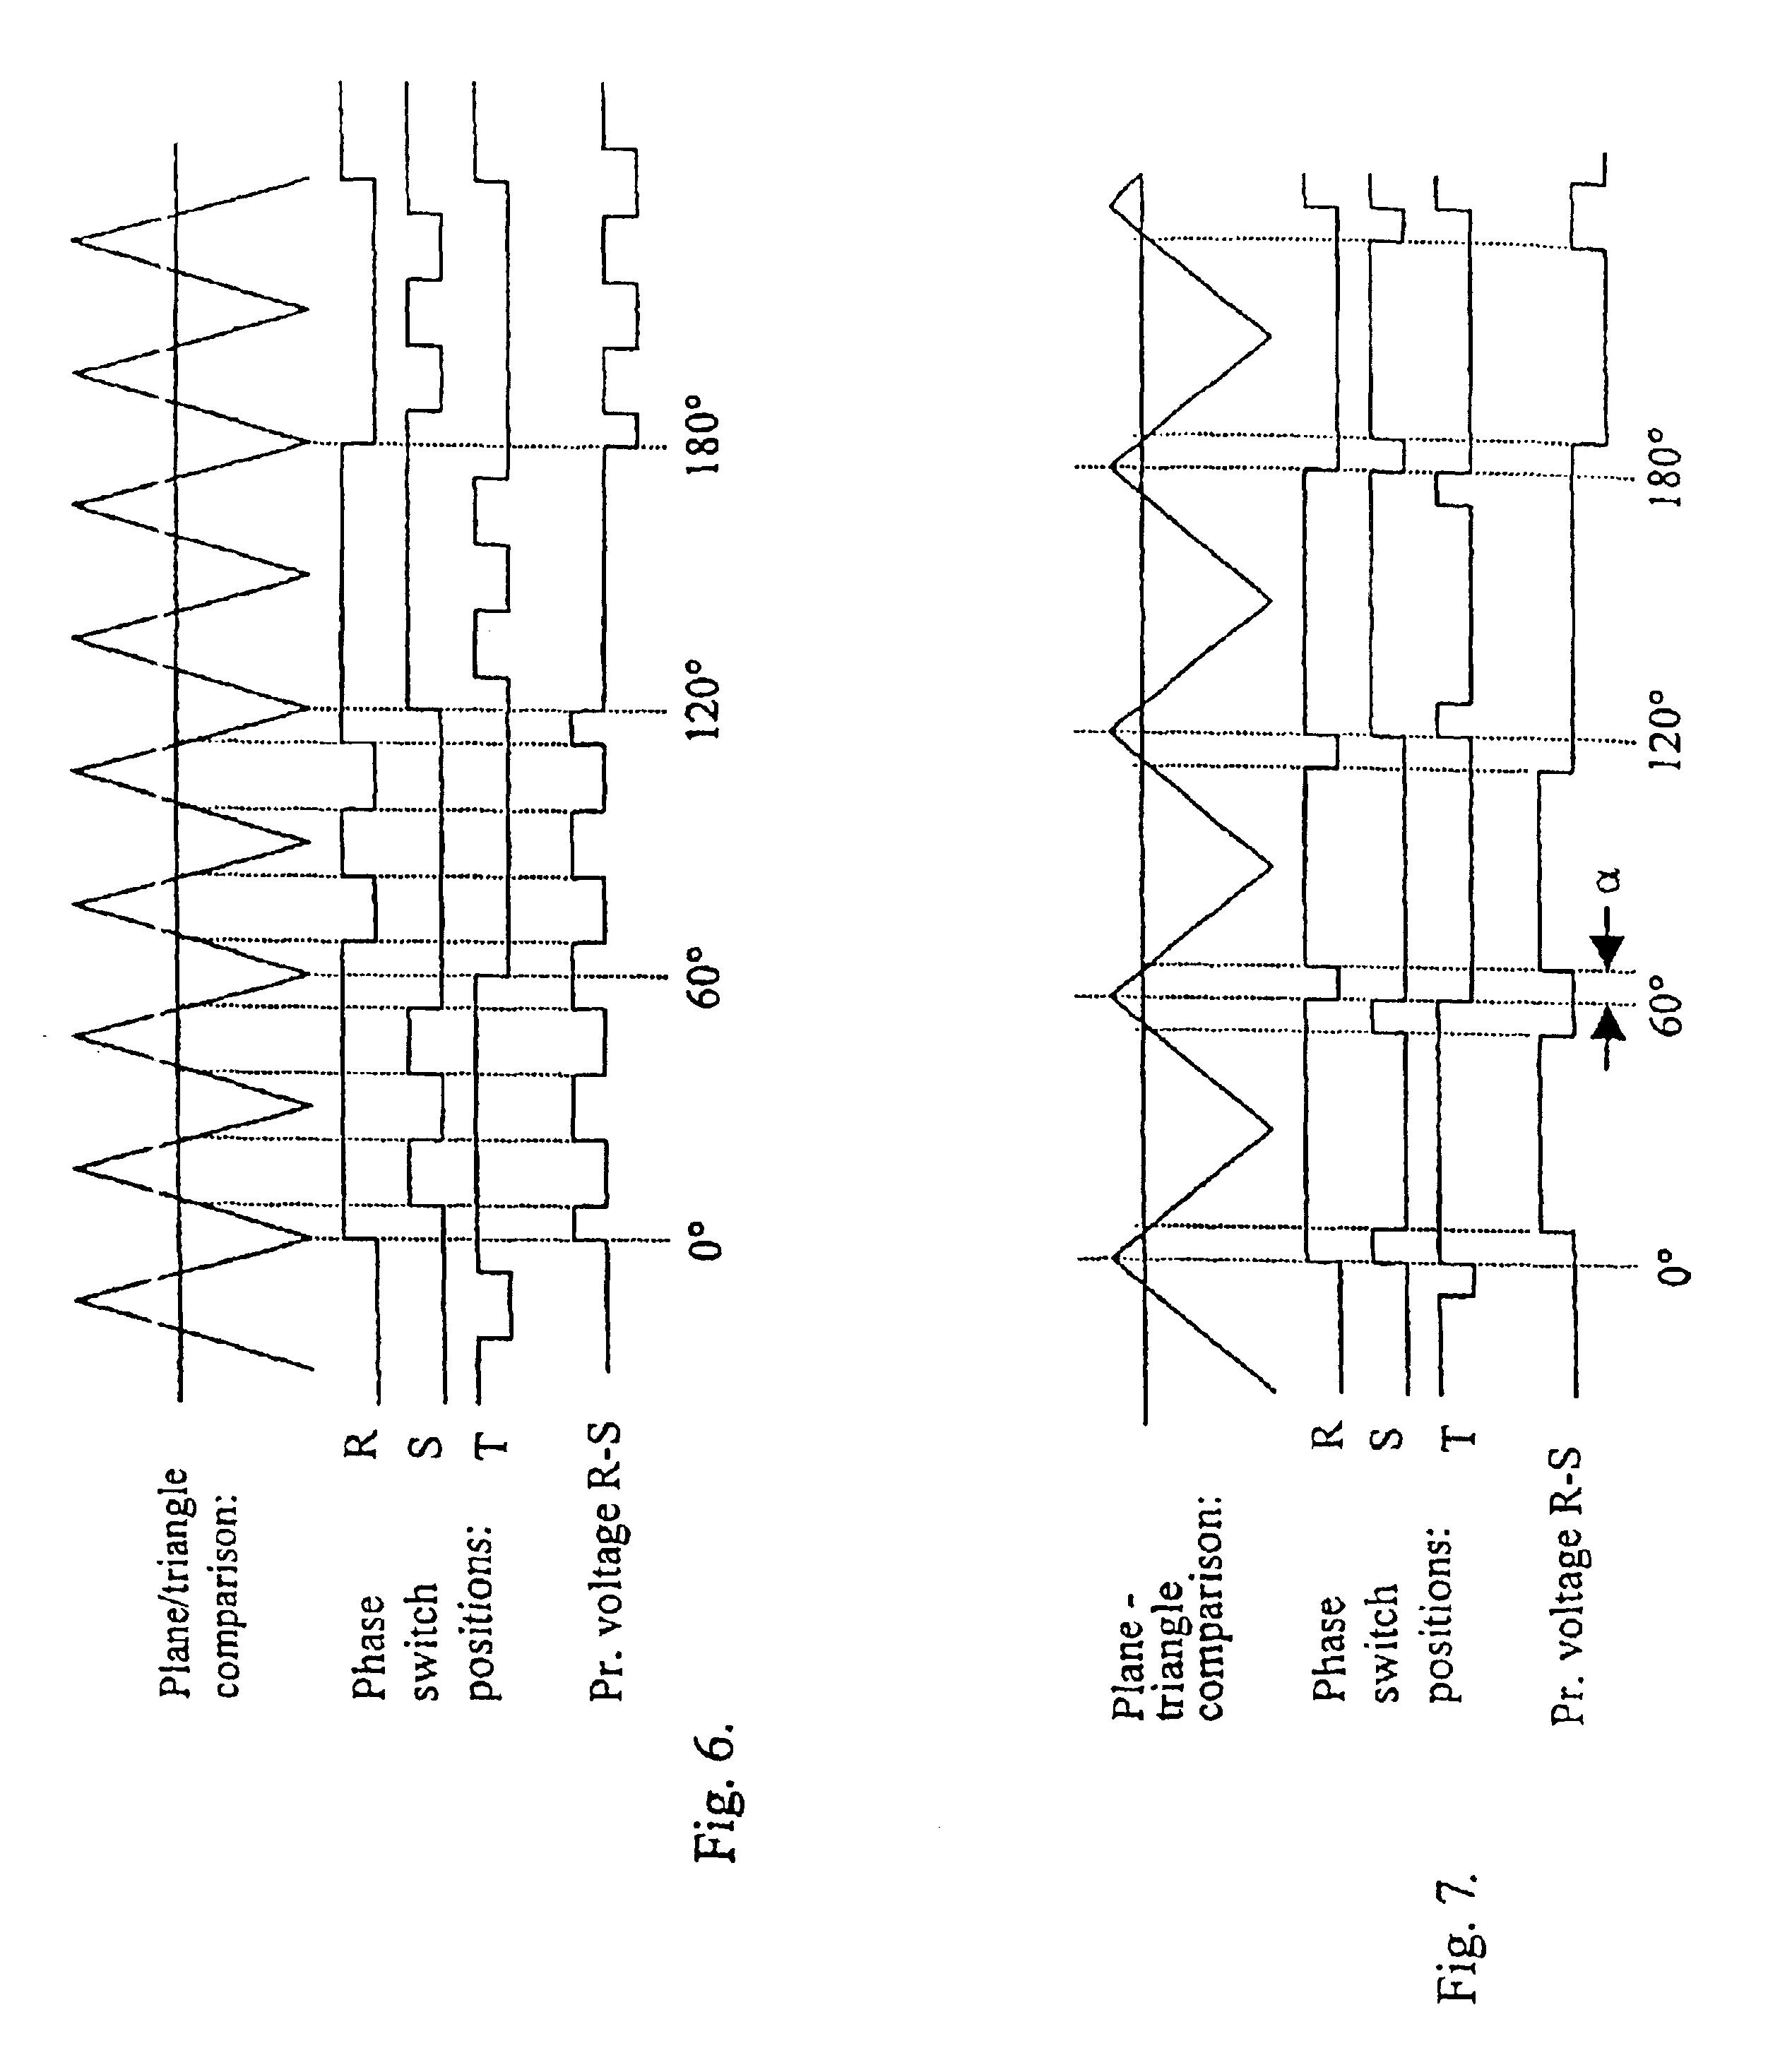 pulse-width-modulator-pwm-cypress-semiconductor